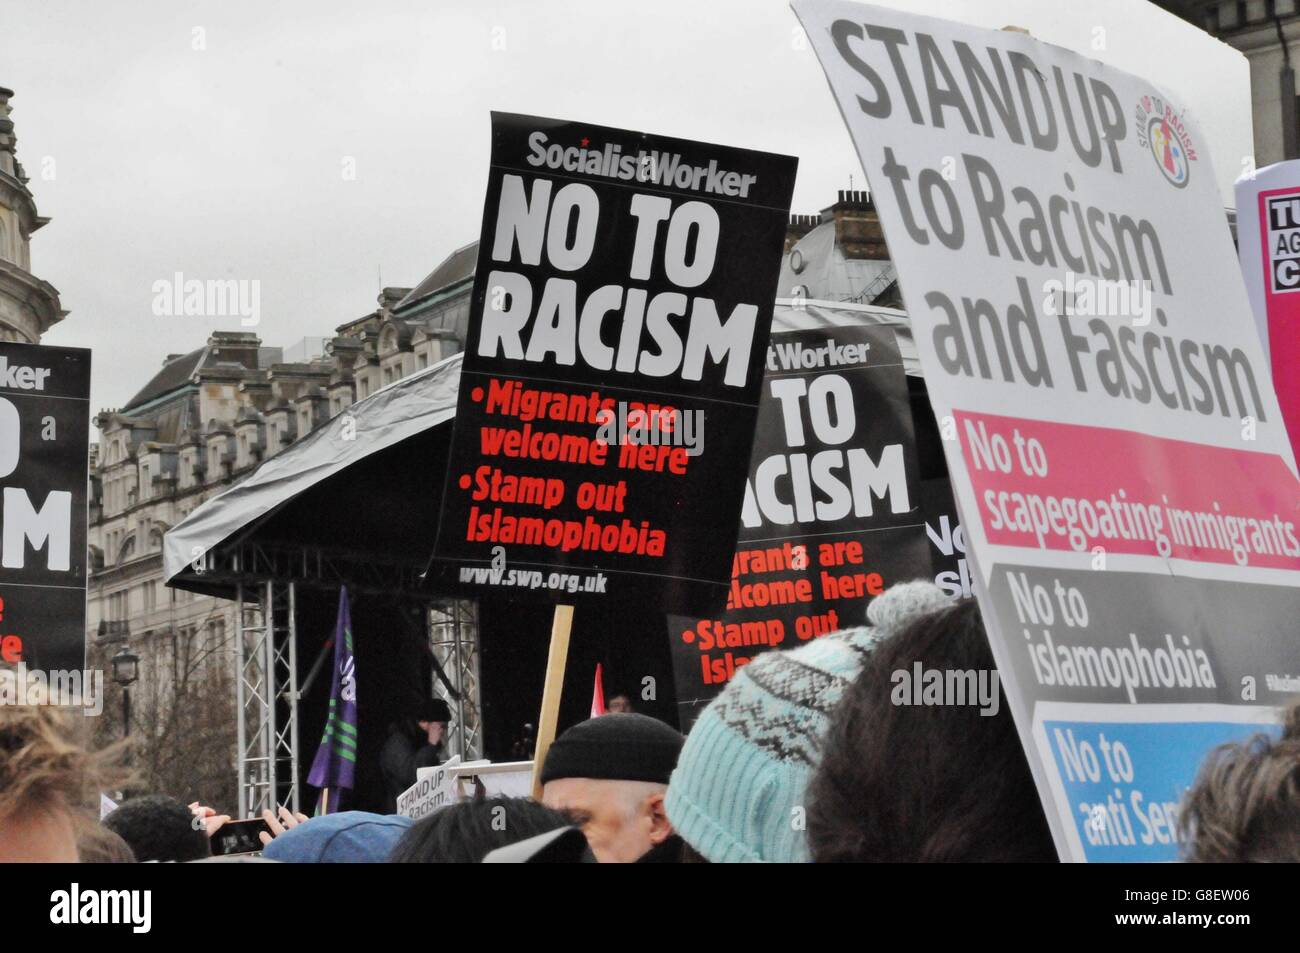 UN Anti-racist demonstration in London's Trafalgar square - Stock Image